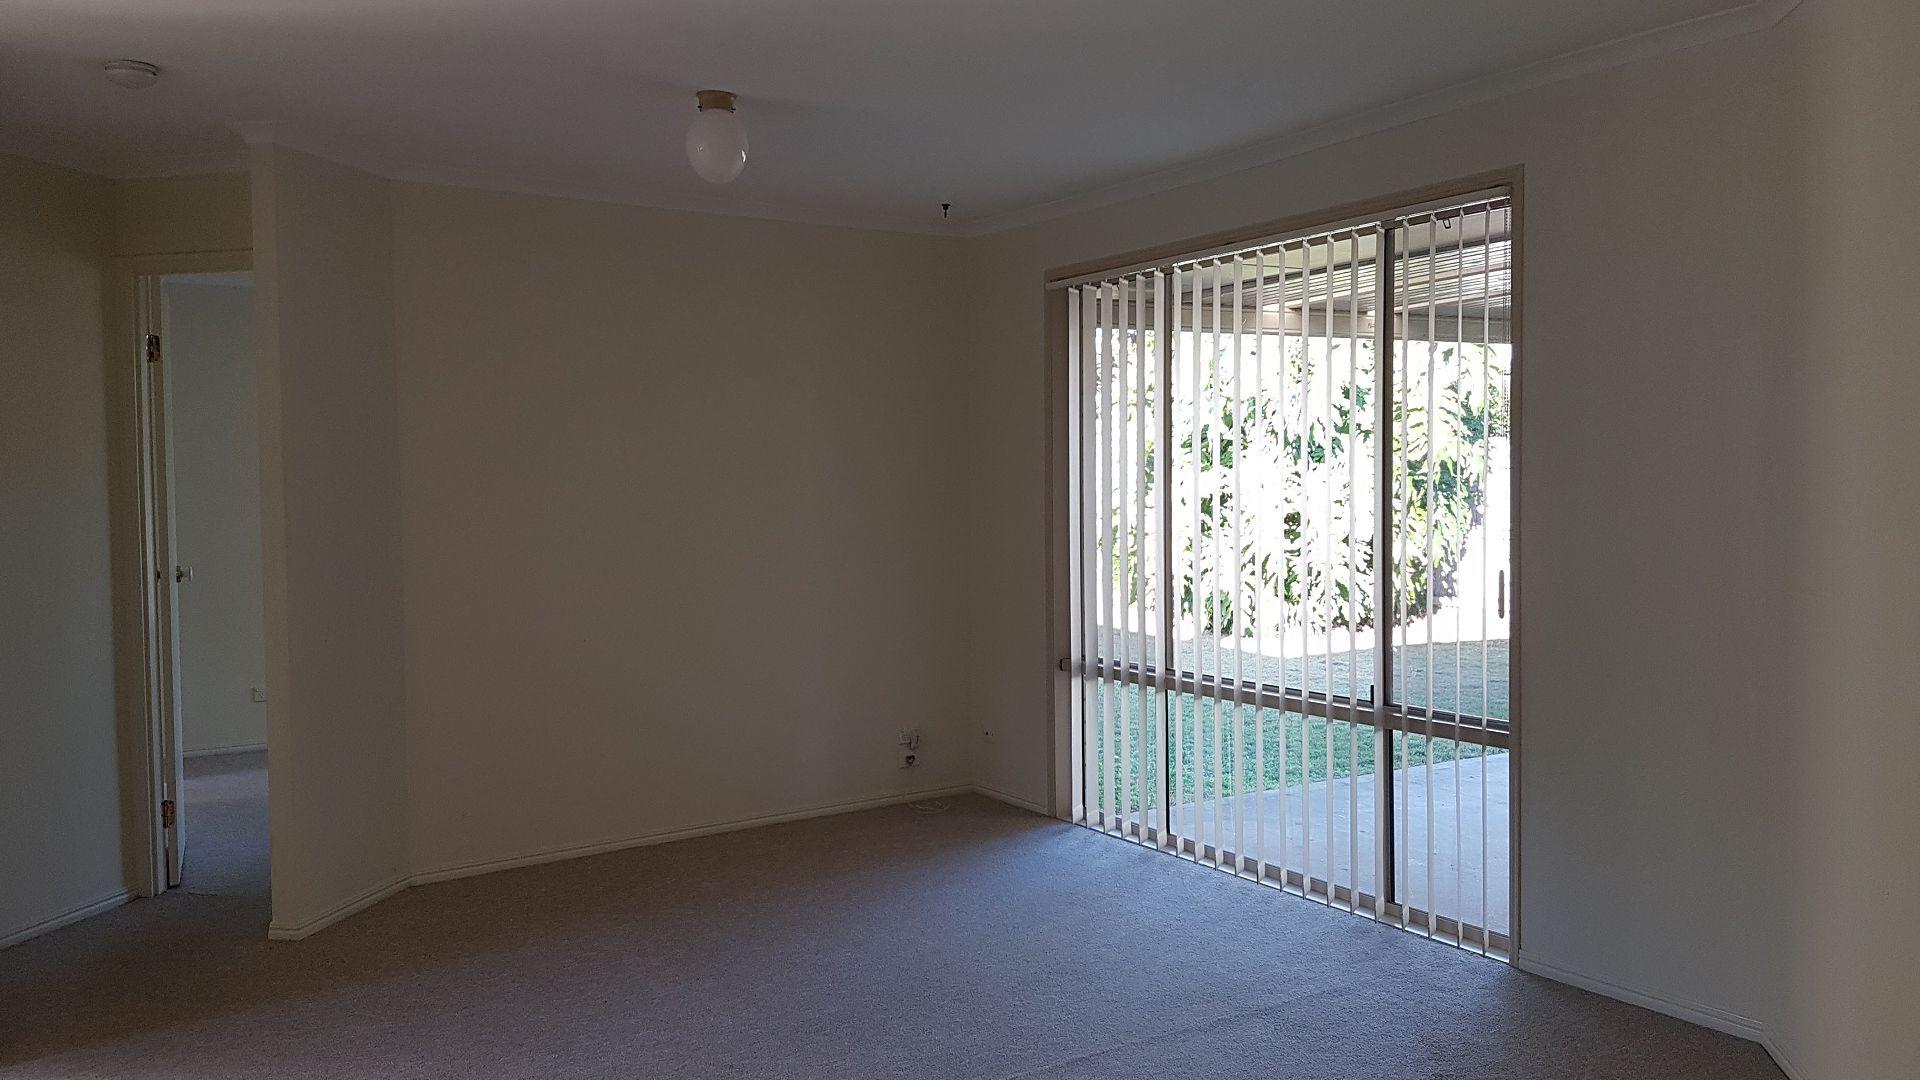 2/53 Hutley  Drive, Lennox Head NSW 2478, Image 1